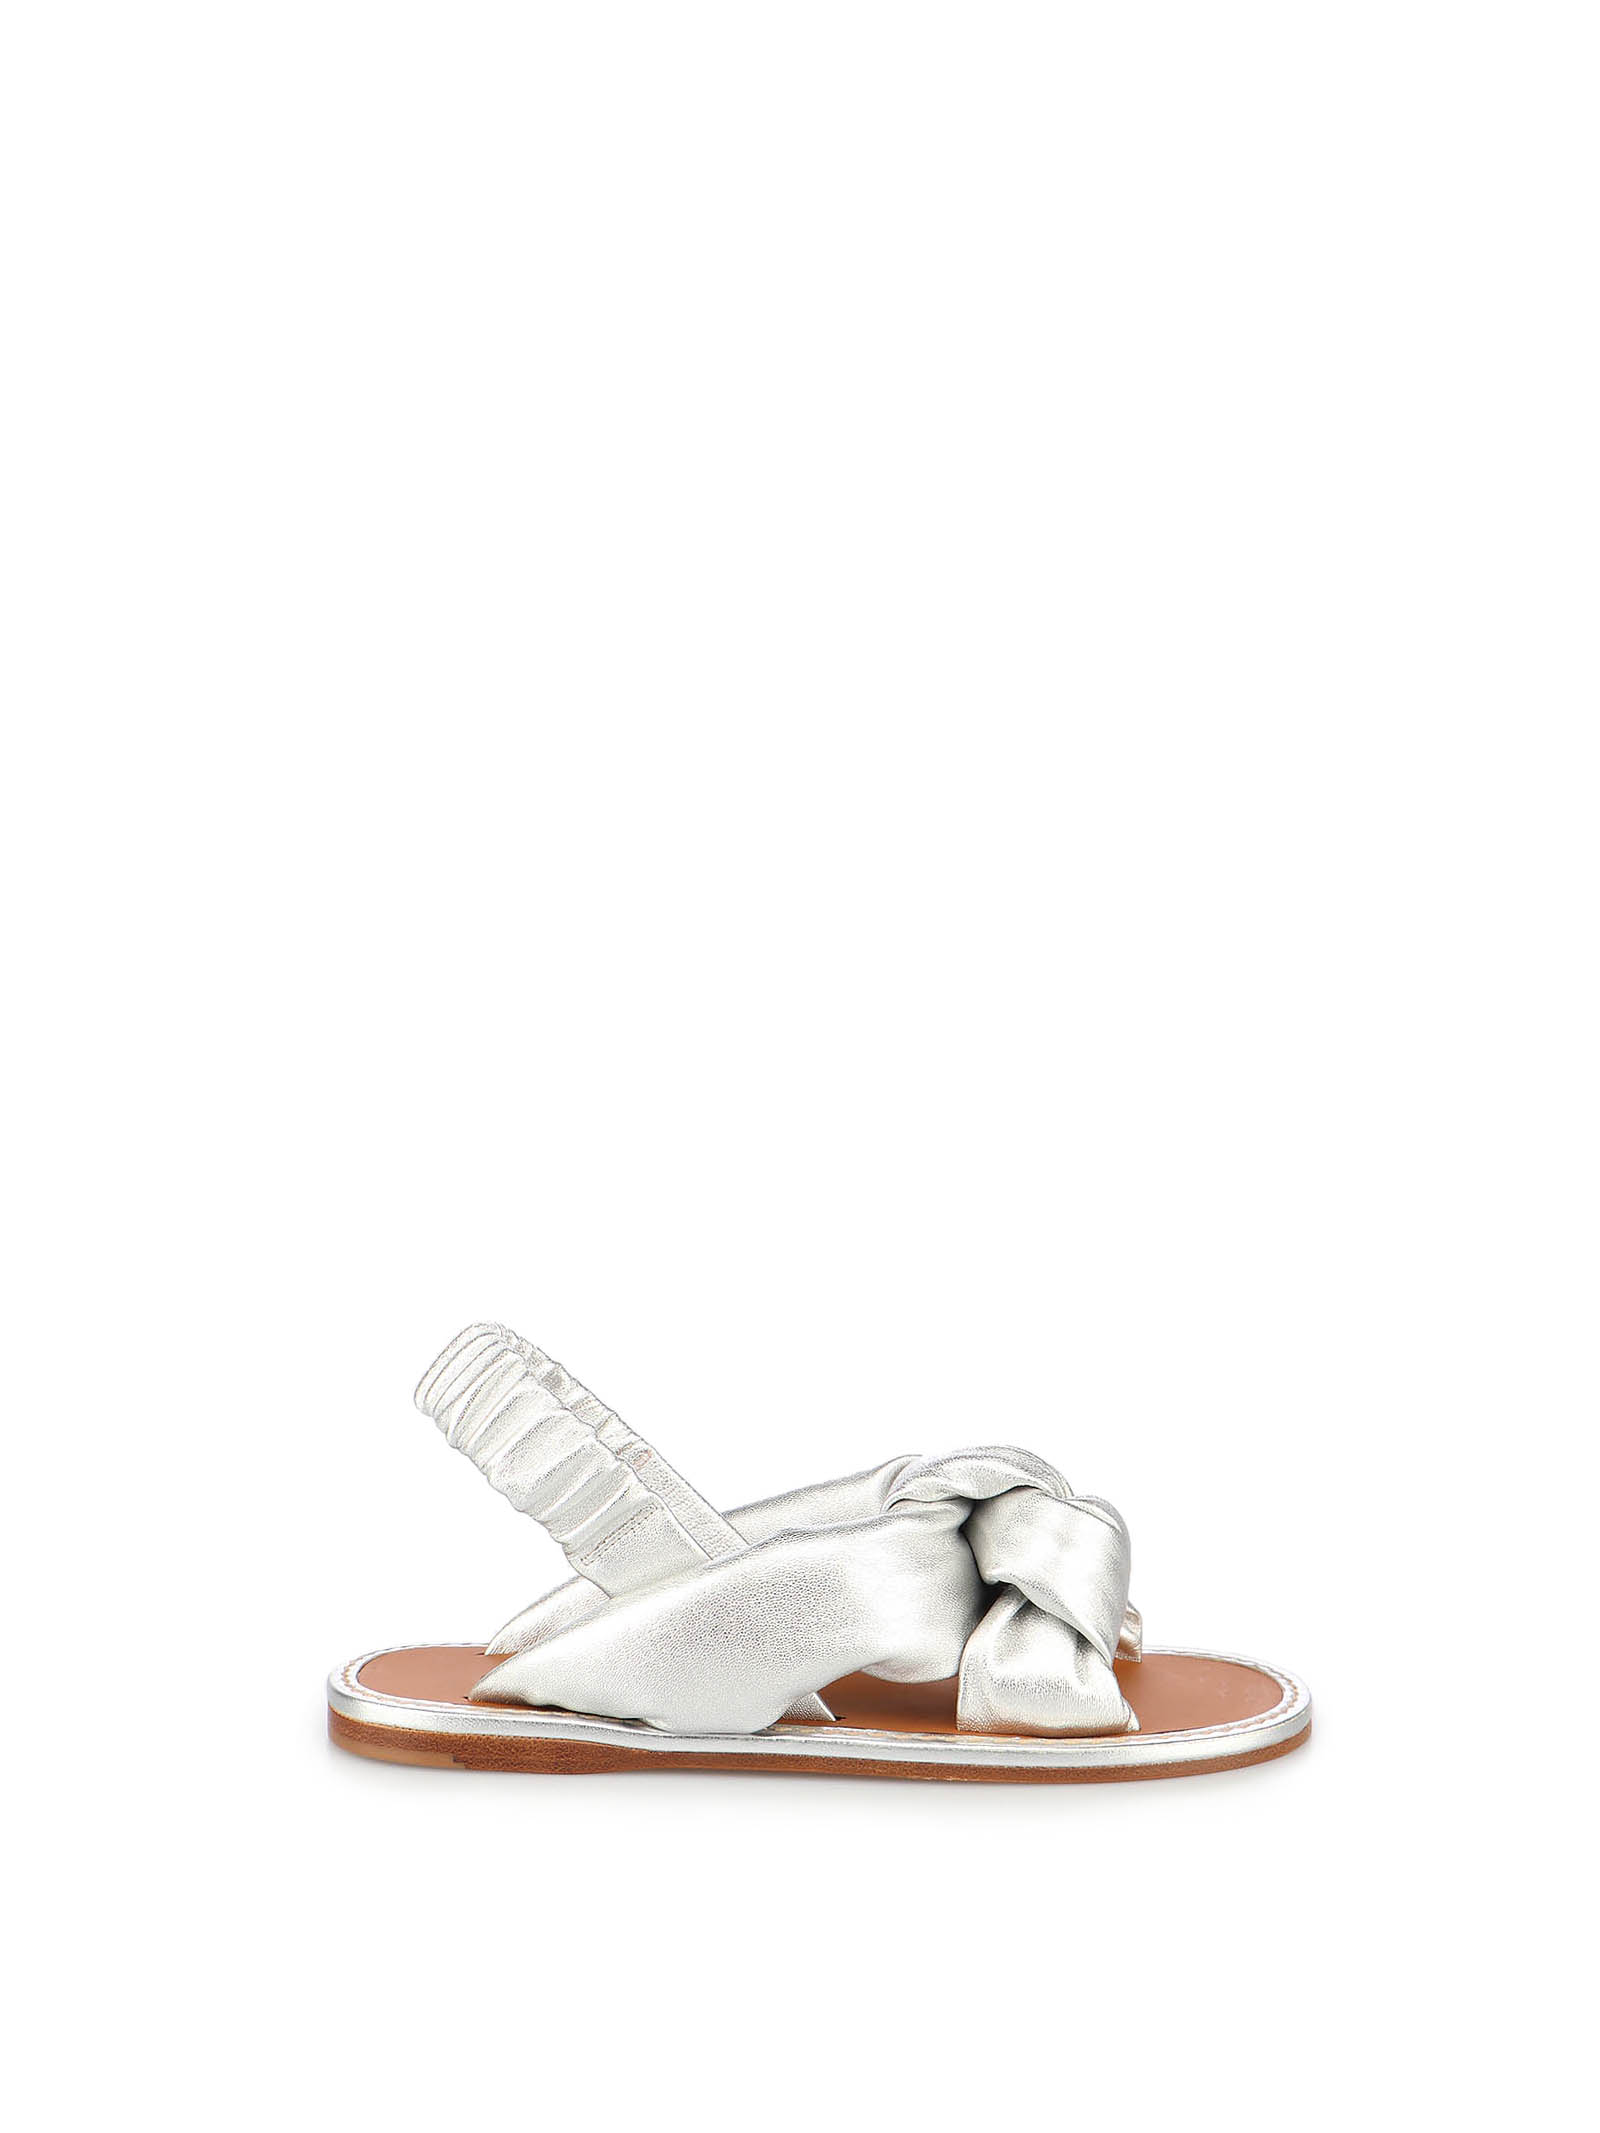 Picture of Miu Miu   Padded Mordoré Nappa Leather Flat Sandals